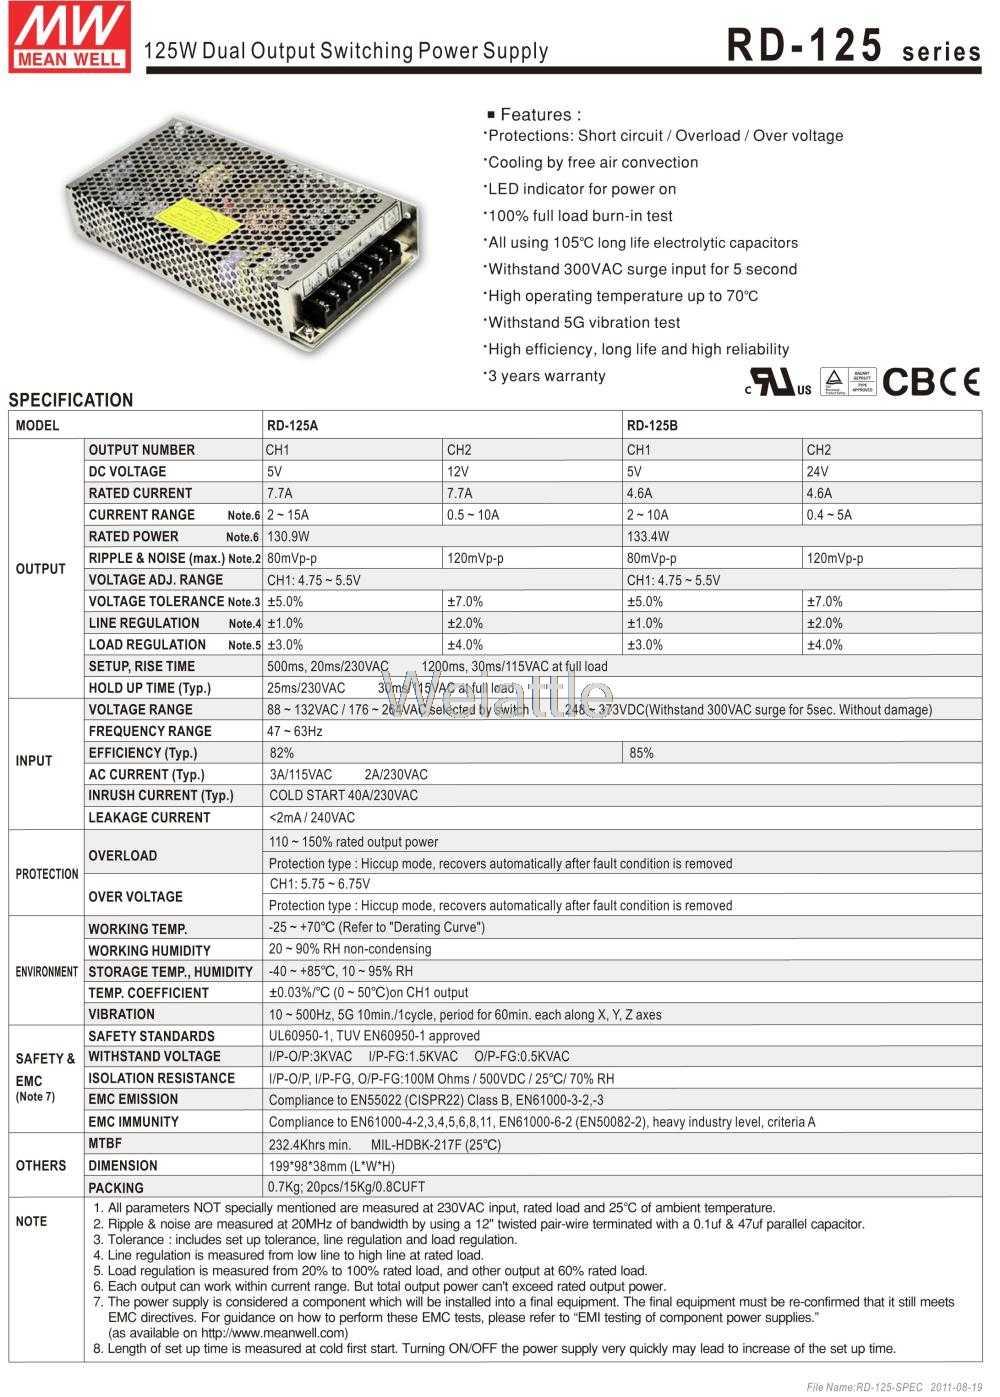 MEAN WELL RD-125A 131W 5V 12V  RD-125B 133W 5V 24V Dual Output Switching Power Supply